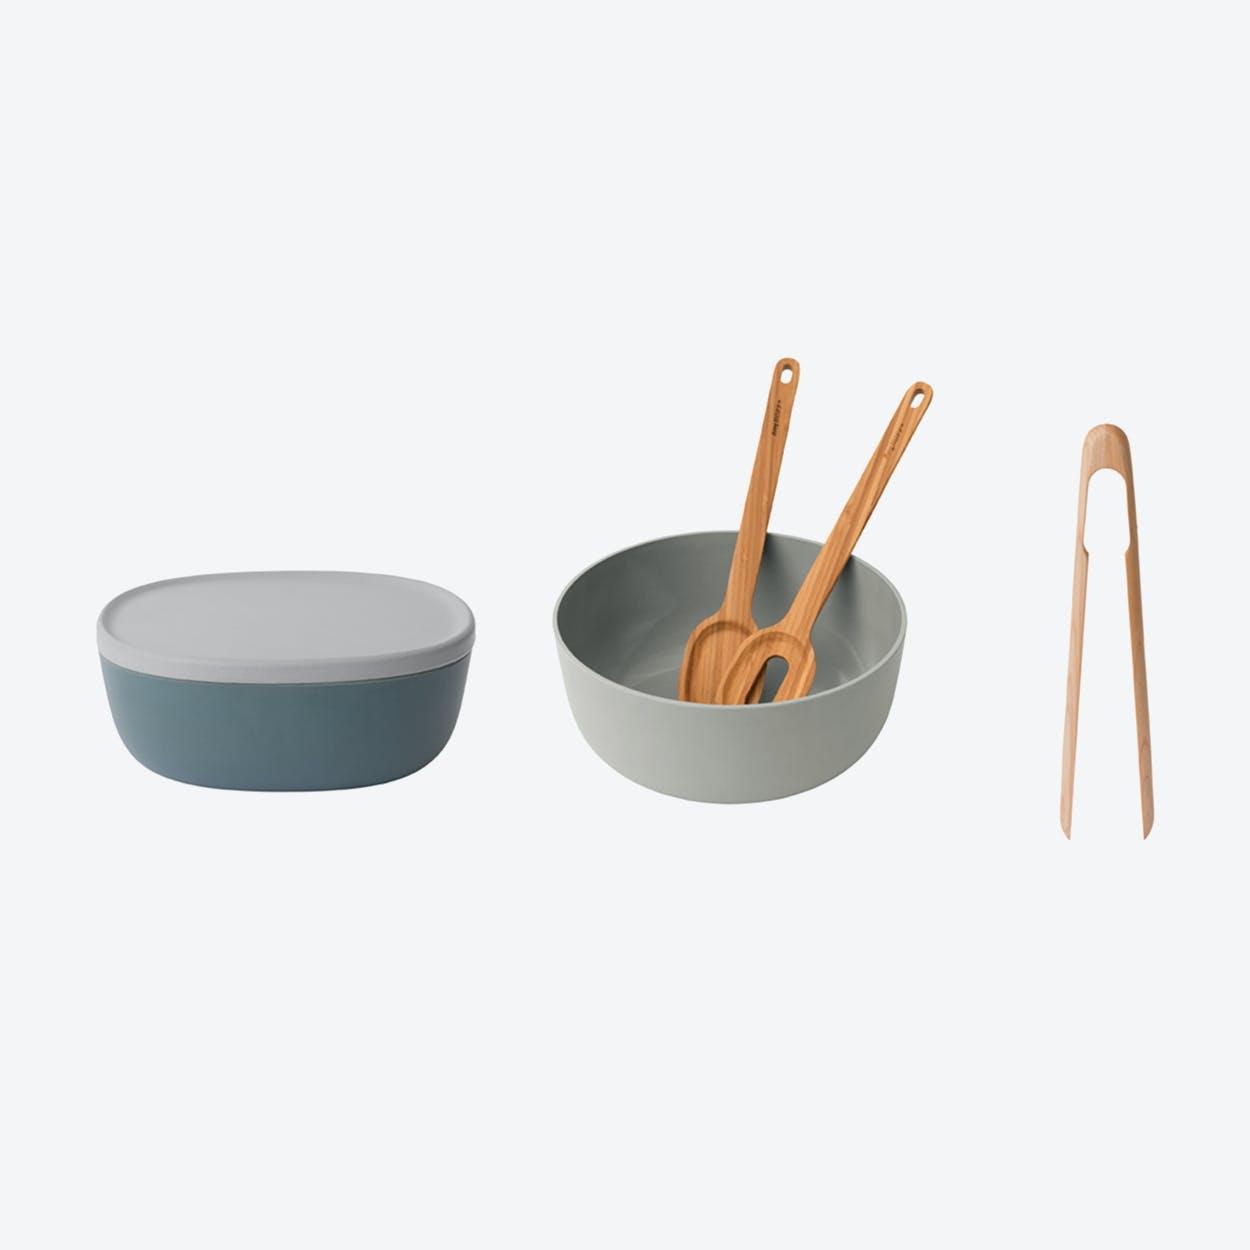 Bowl w/ Servers and Tongs Set